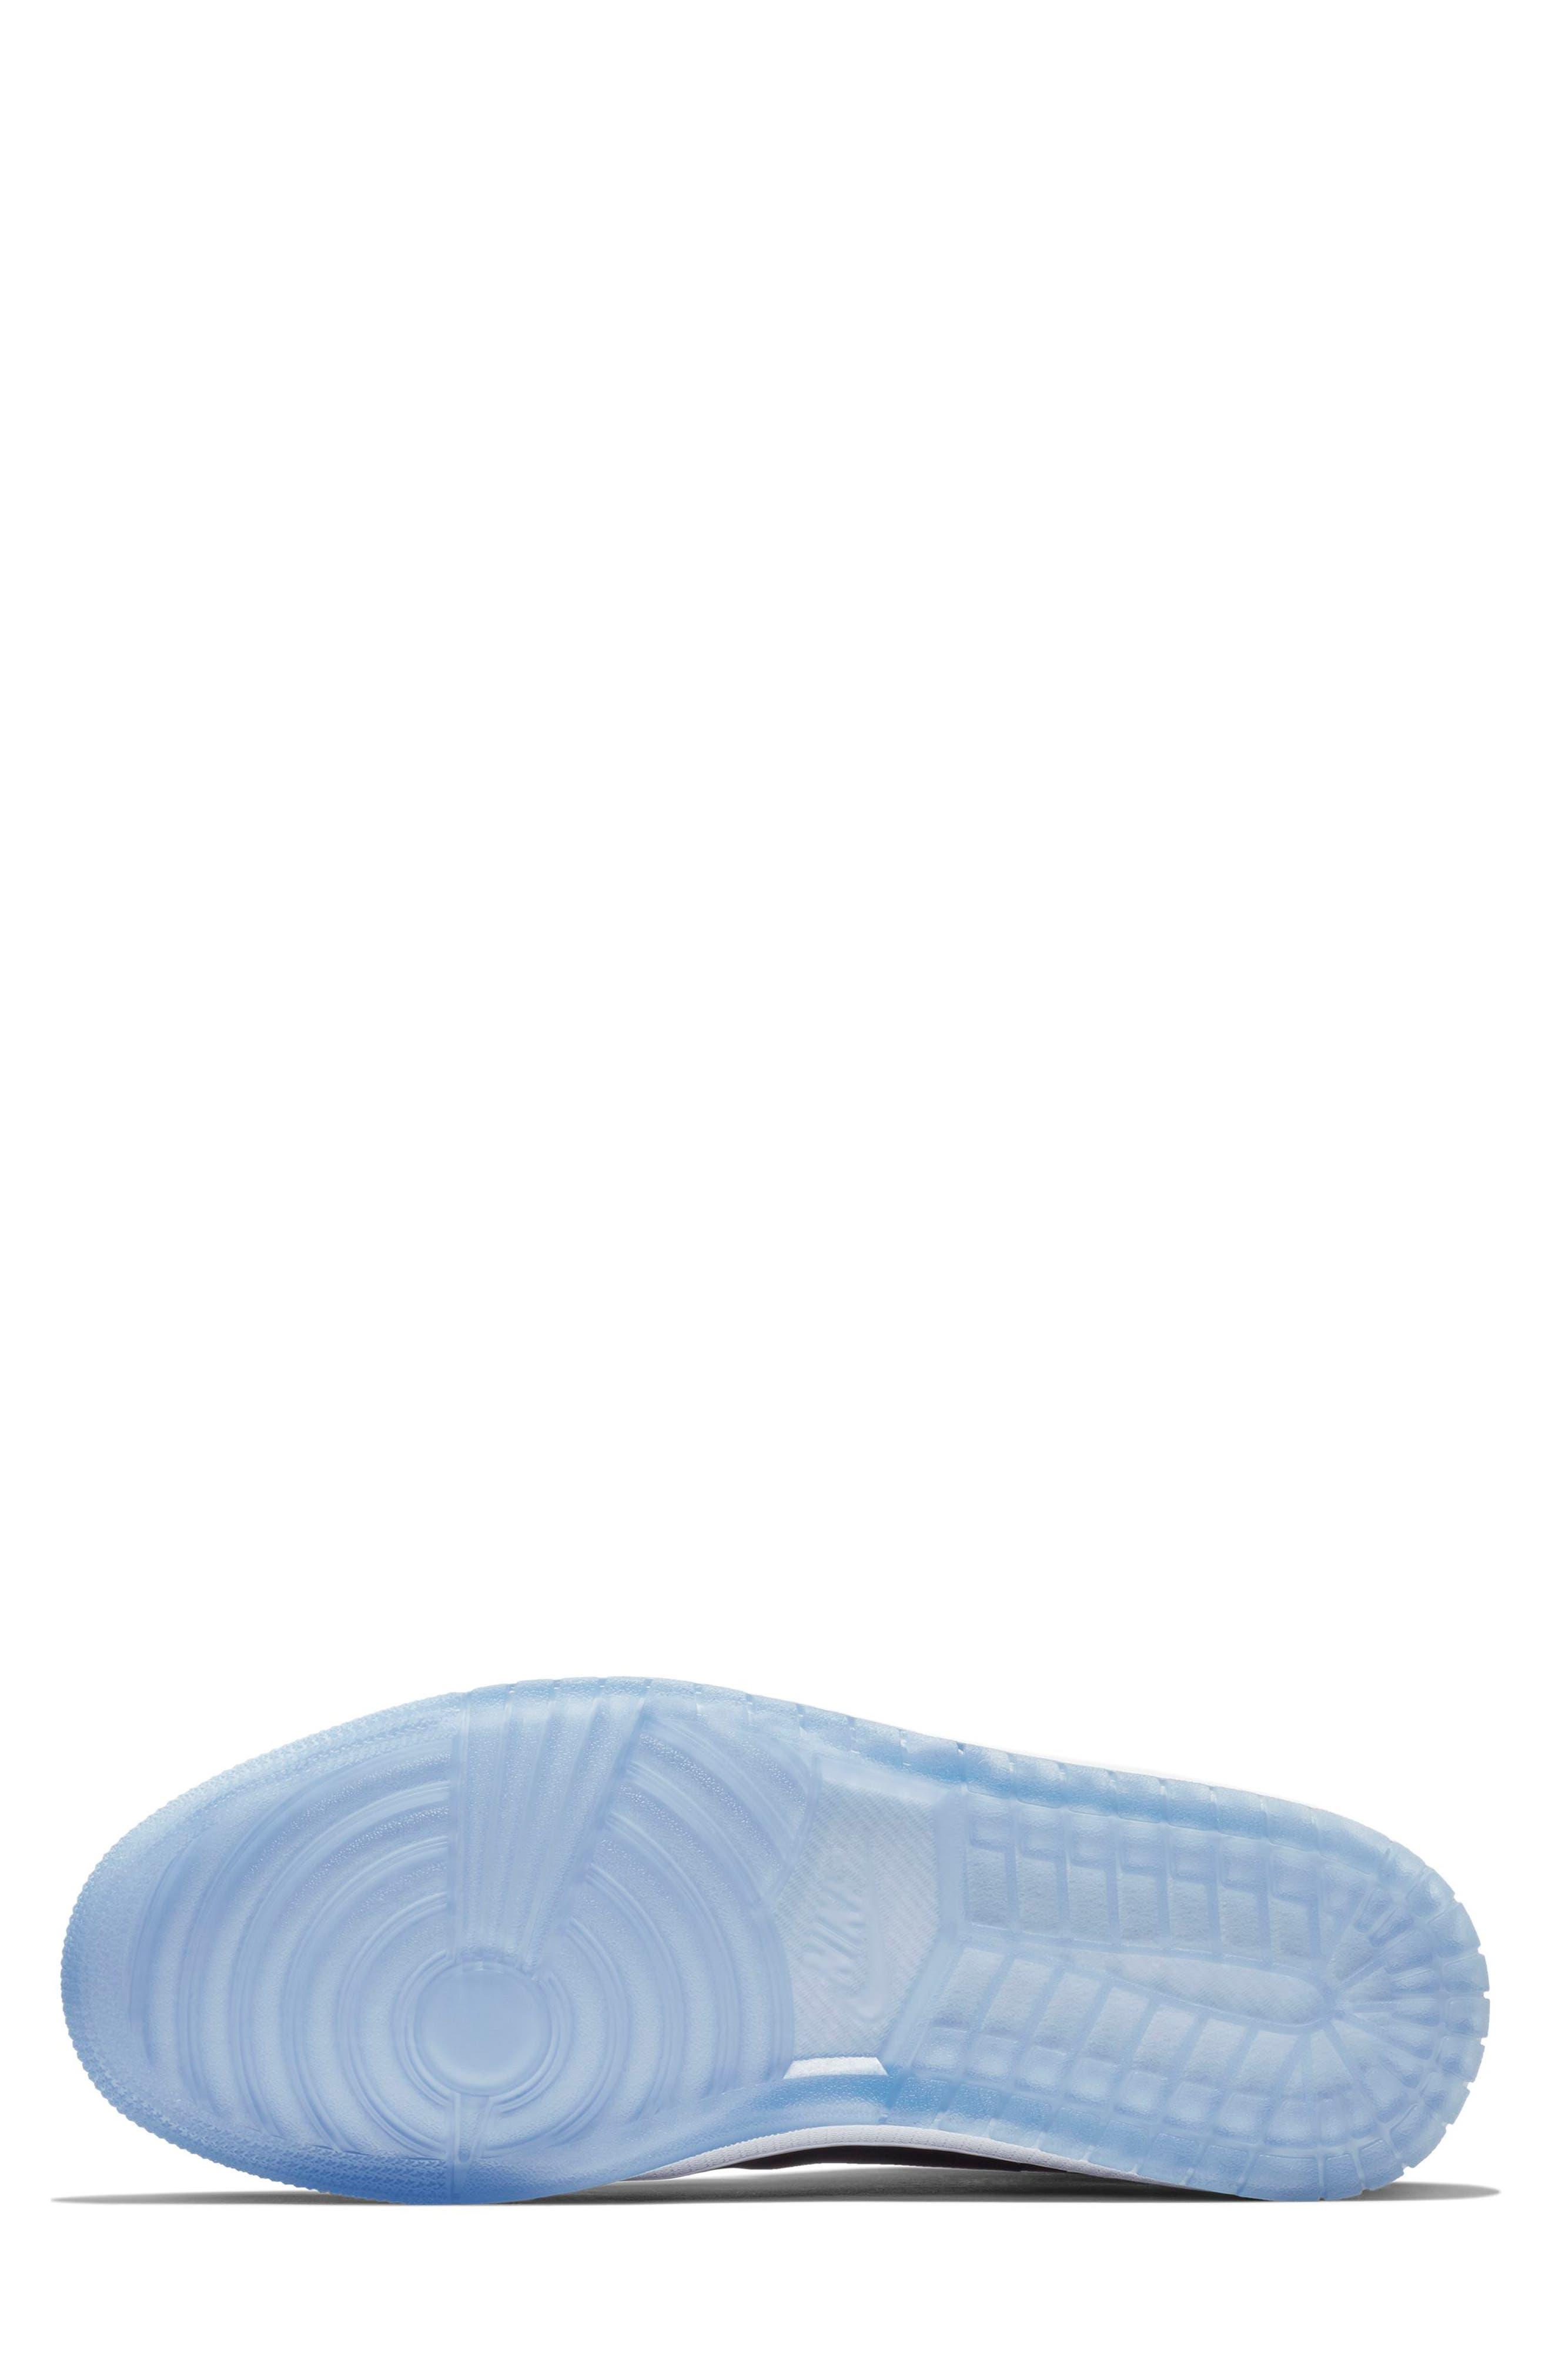 Air Jordan 1 Retro High Double Strap Sneaker,                             Alternate thumbnail 4, color,                             WHITE/ DARK CONCORD/ BLACK